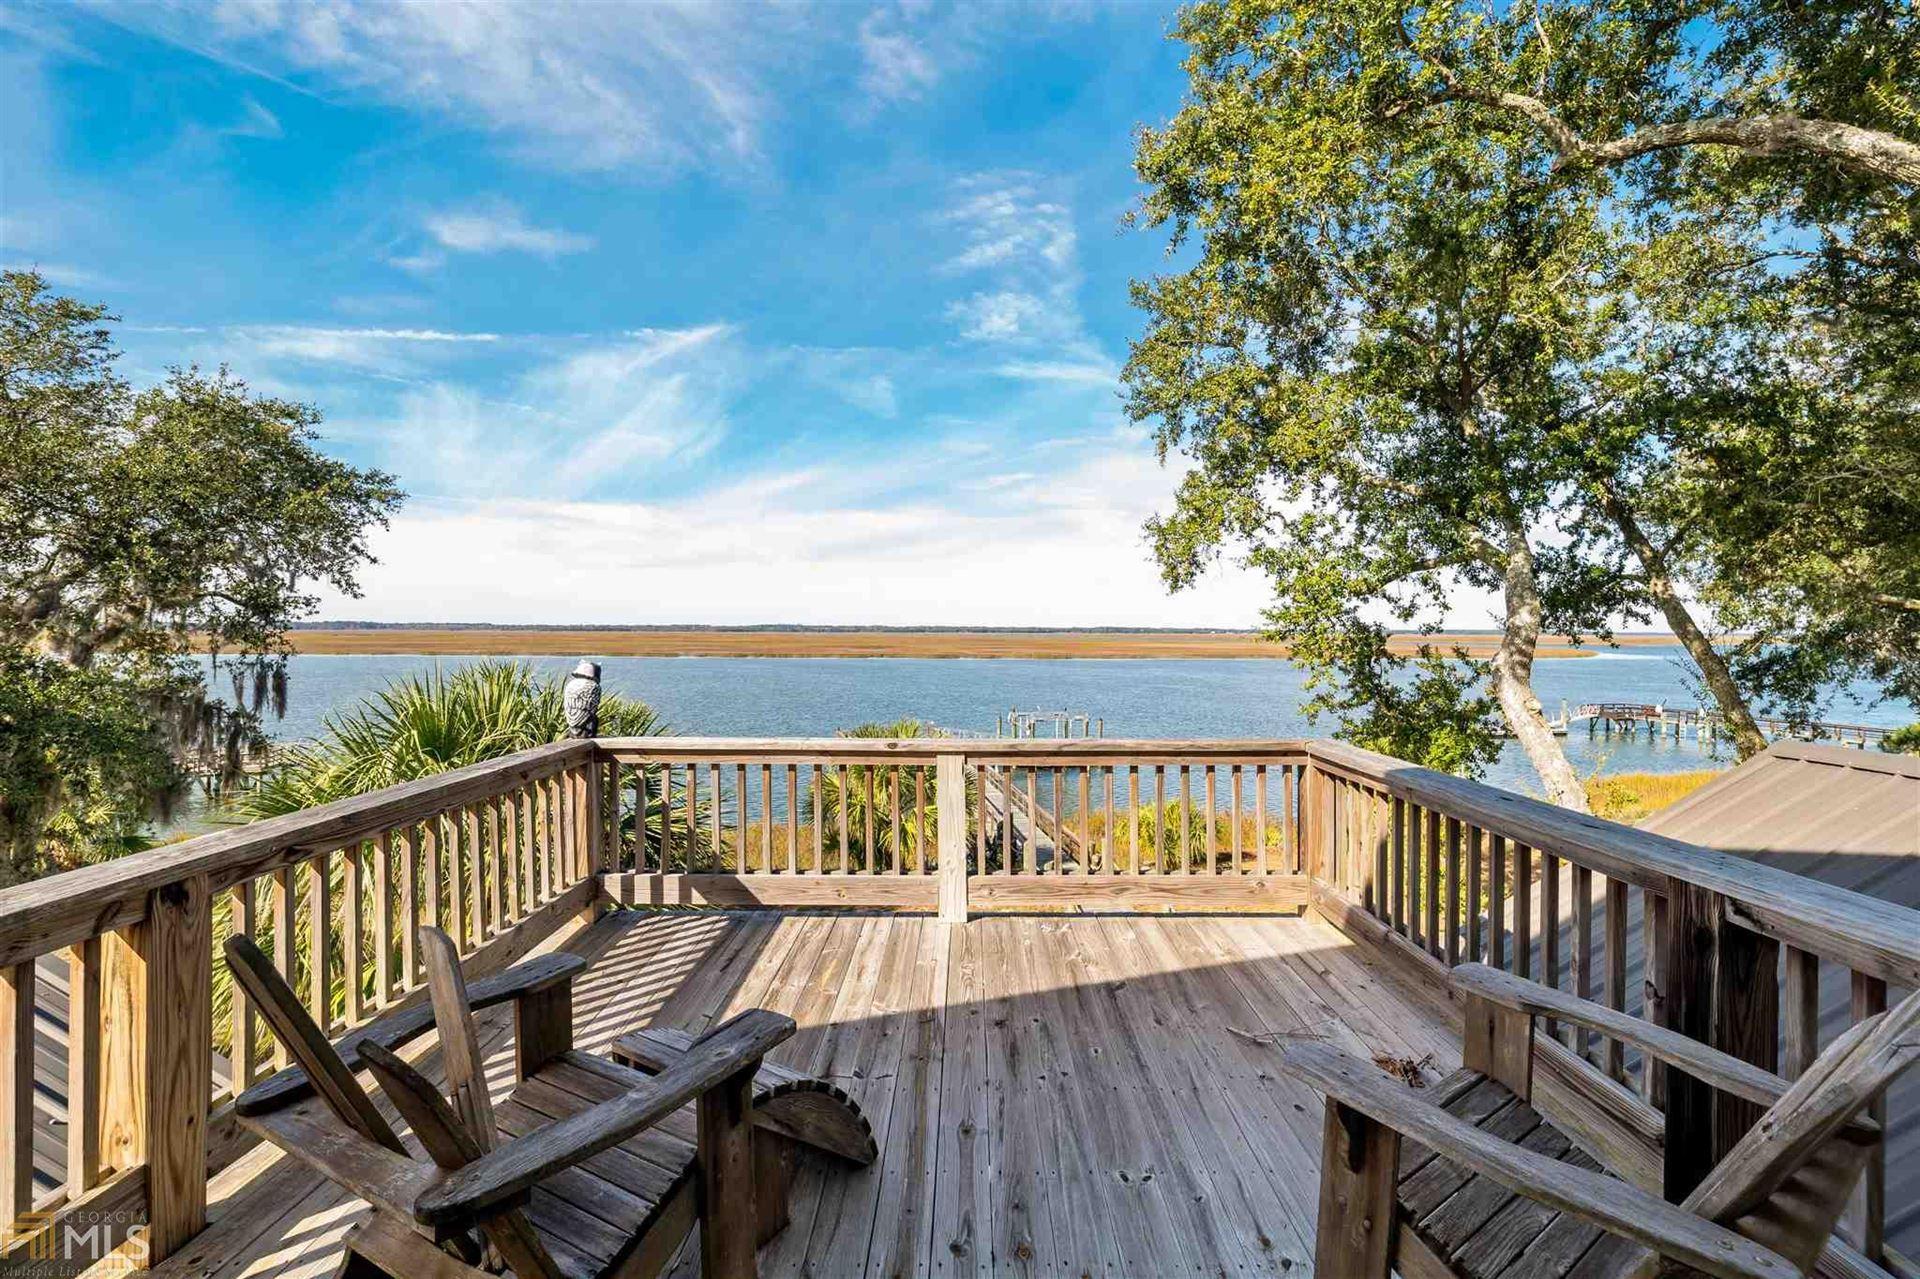 32 Barbour Island, Townsend, GA 31331 - MLS#: 8707729